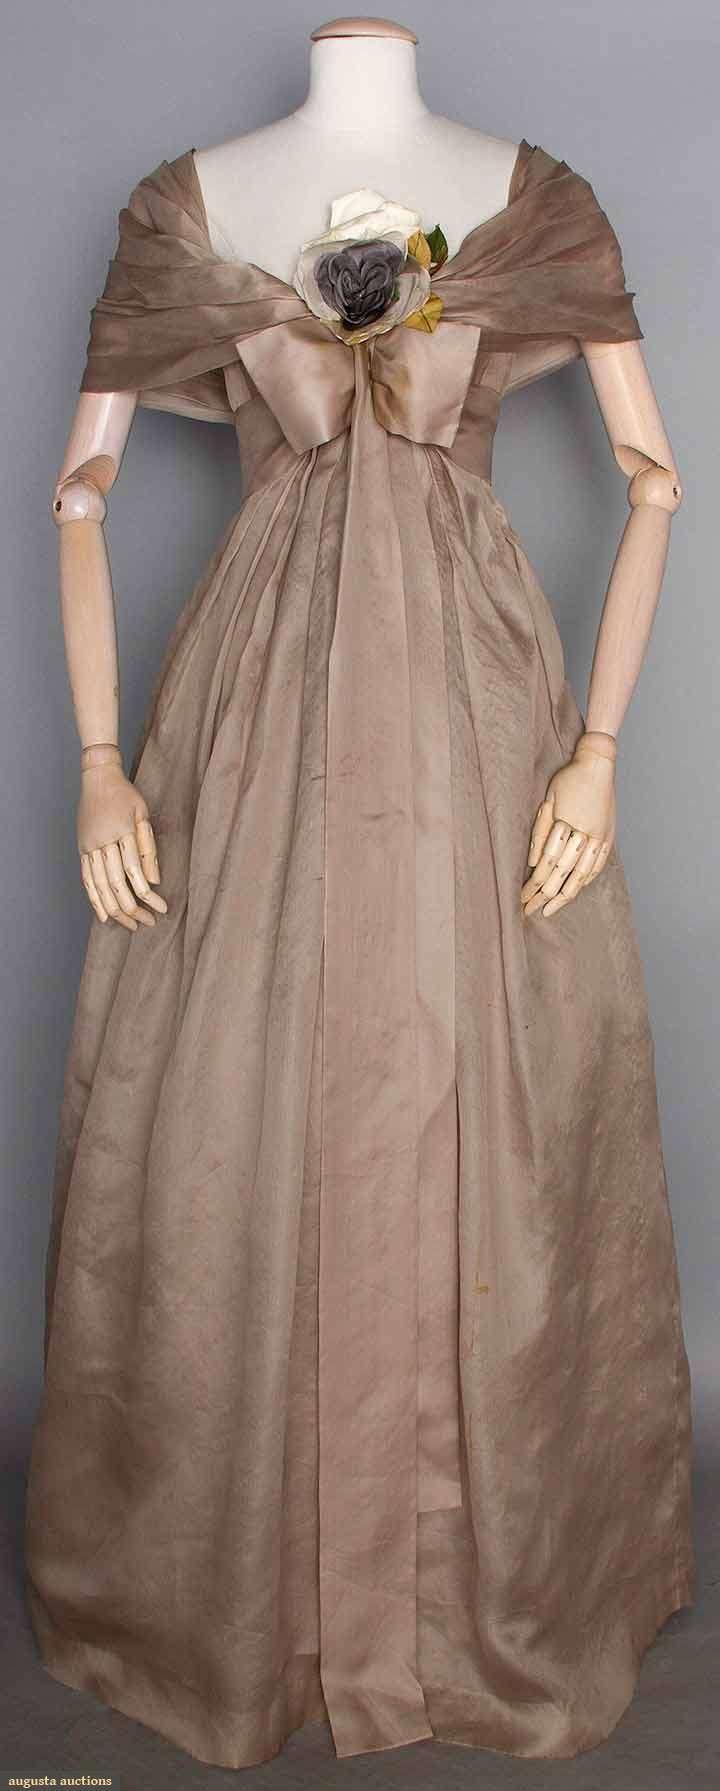 Dior Couture Ballgown, Paris, Spring 1958, Augusta Auctions, November 12, 2014